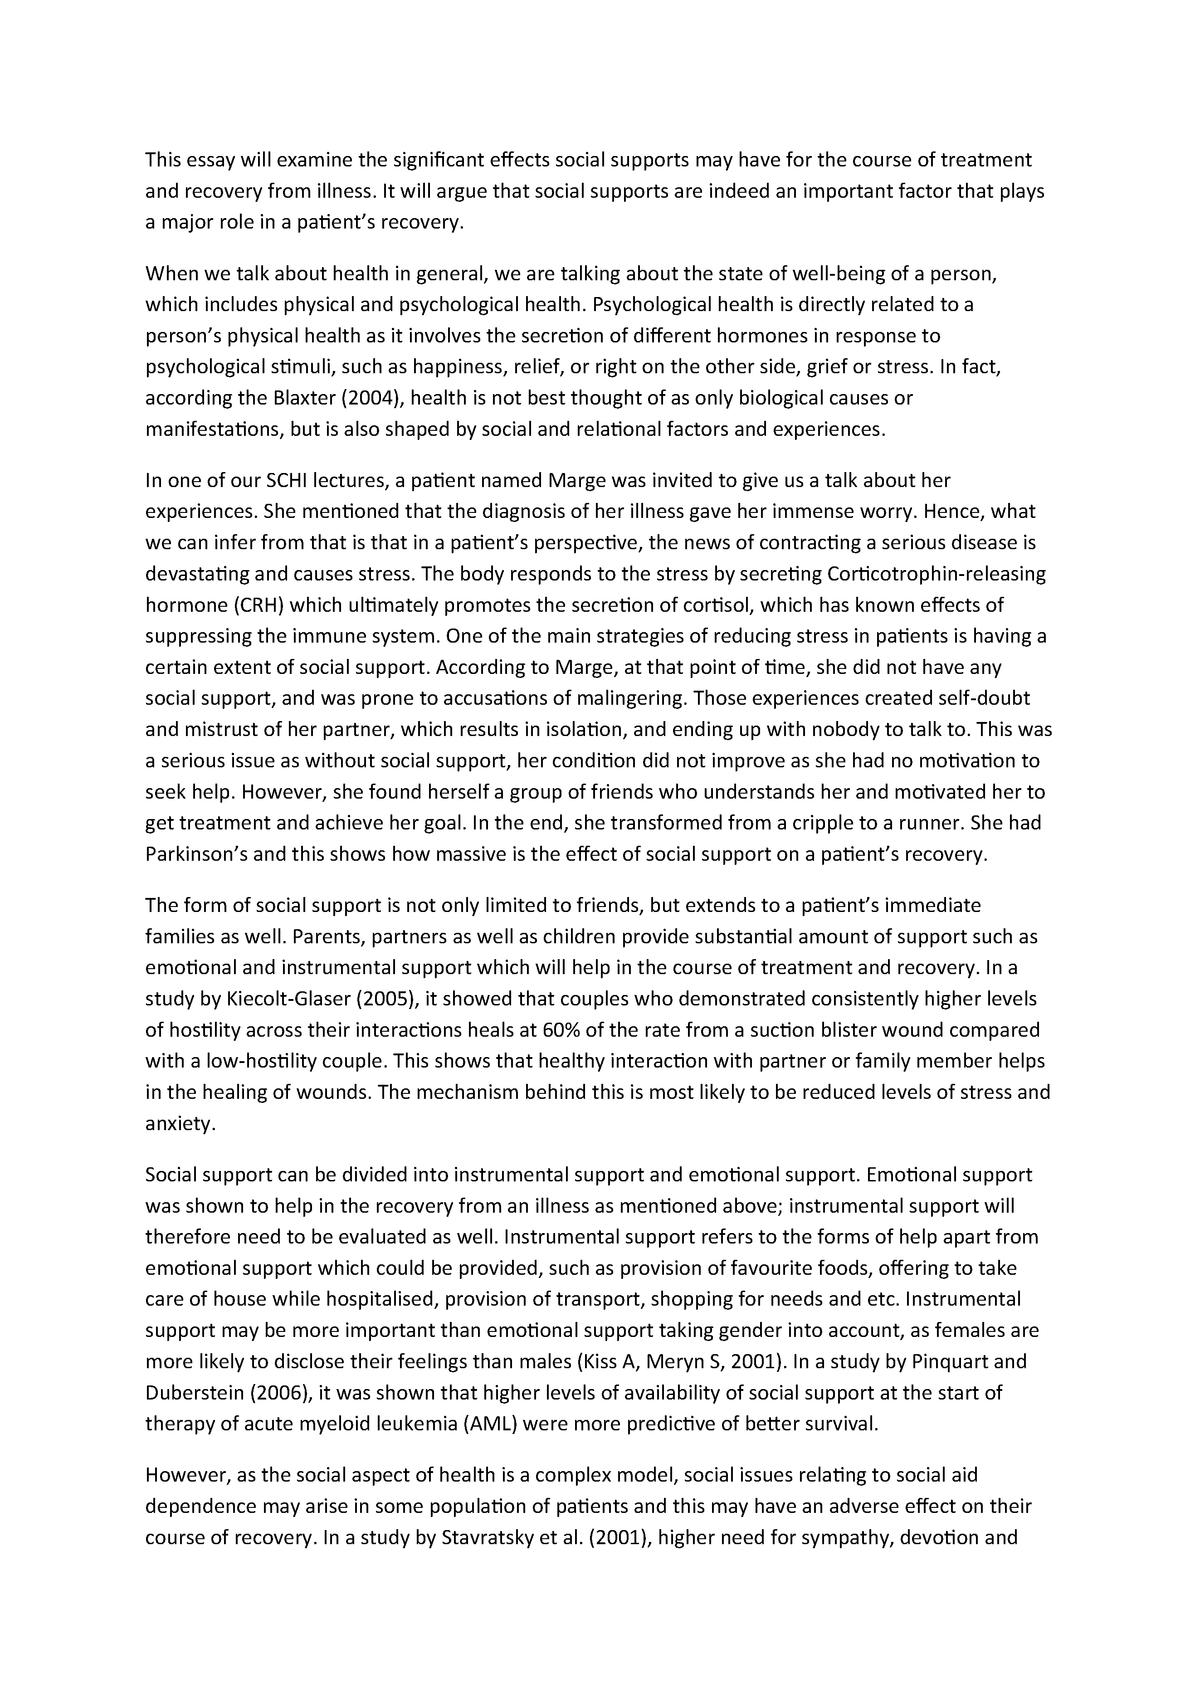 Essay for SCHI supervision 2 - SCHI: Social Context of